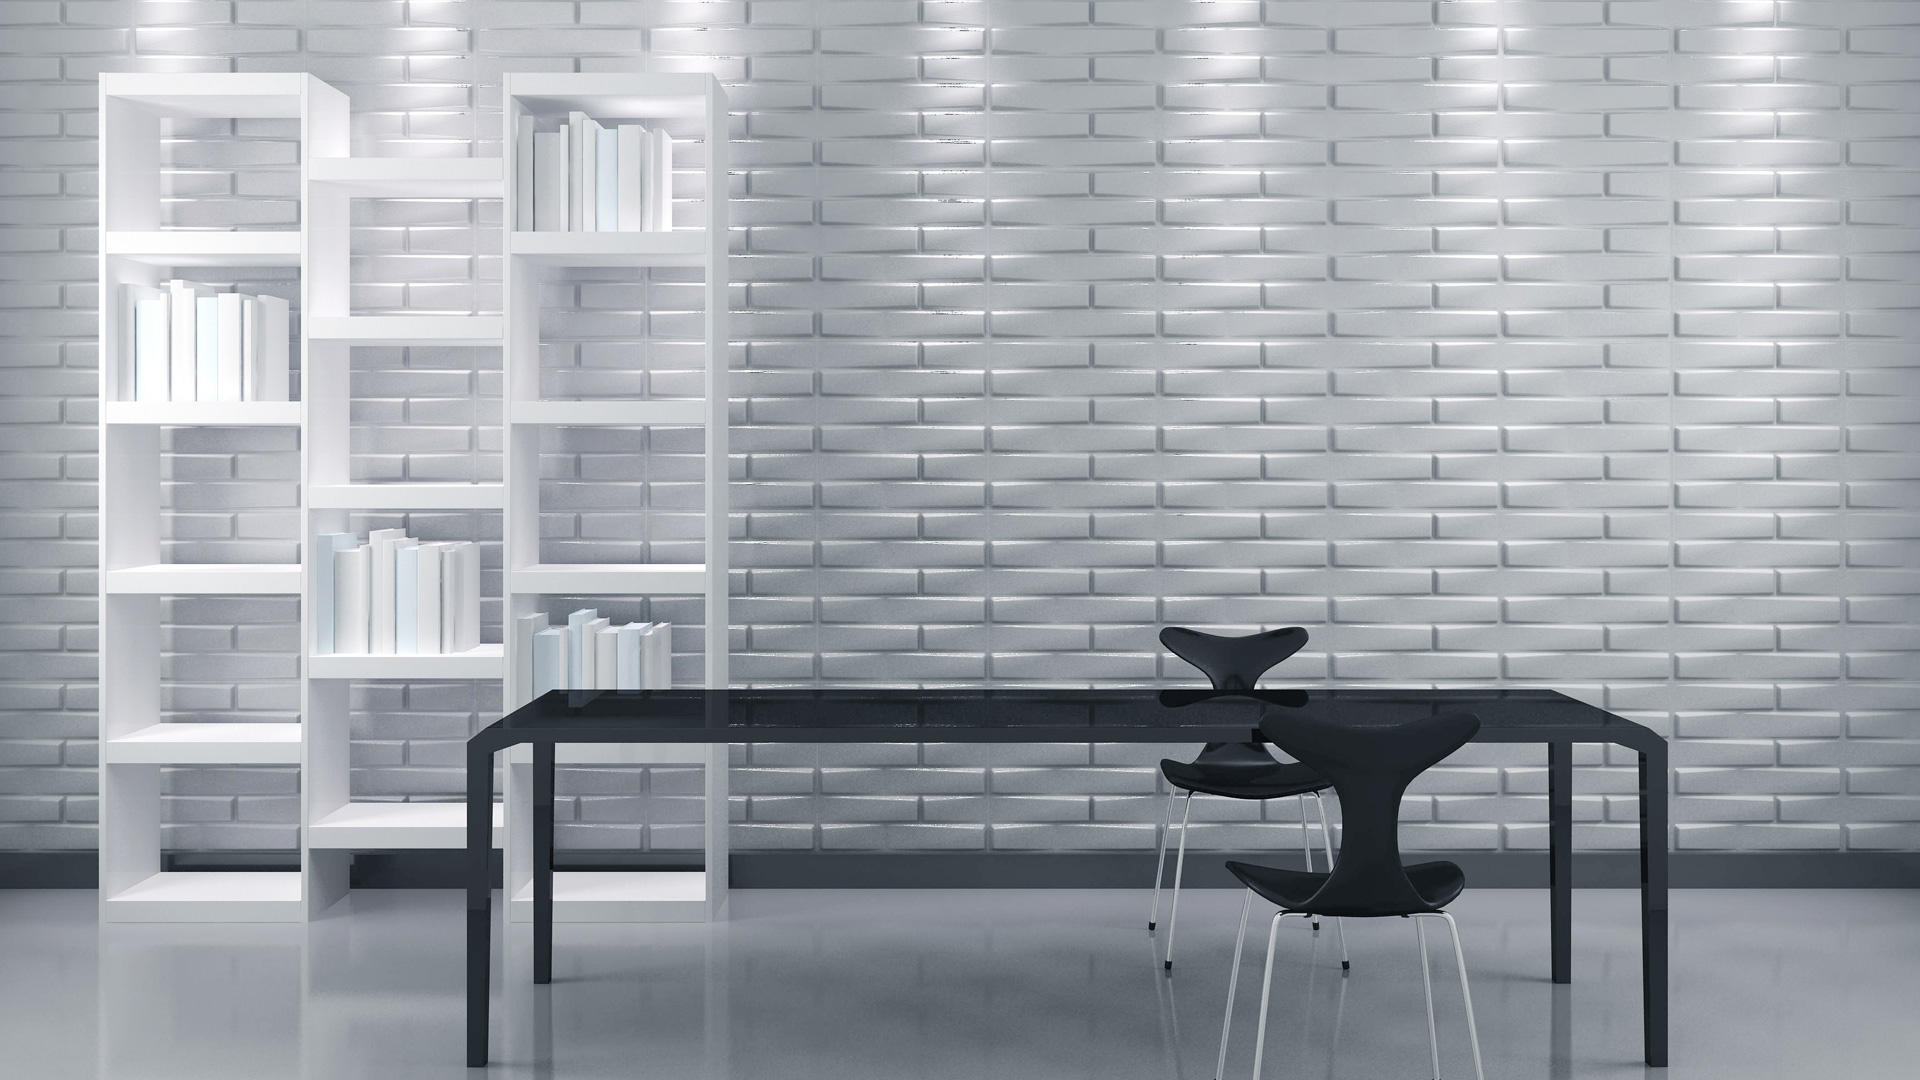 3D Wandpaneele - Produkte - Feelings - Deckenpaneele - 3D Tapeten - Wandverkleidung